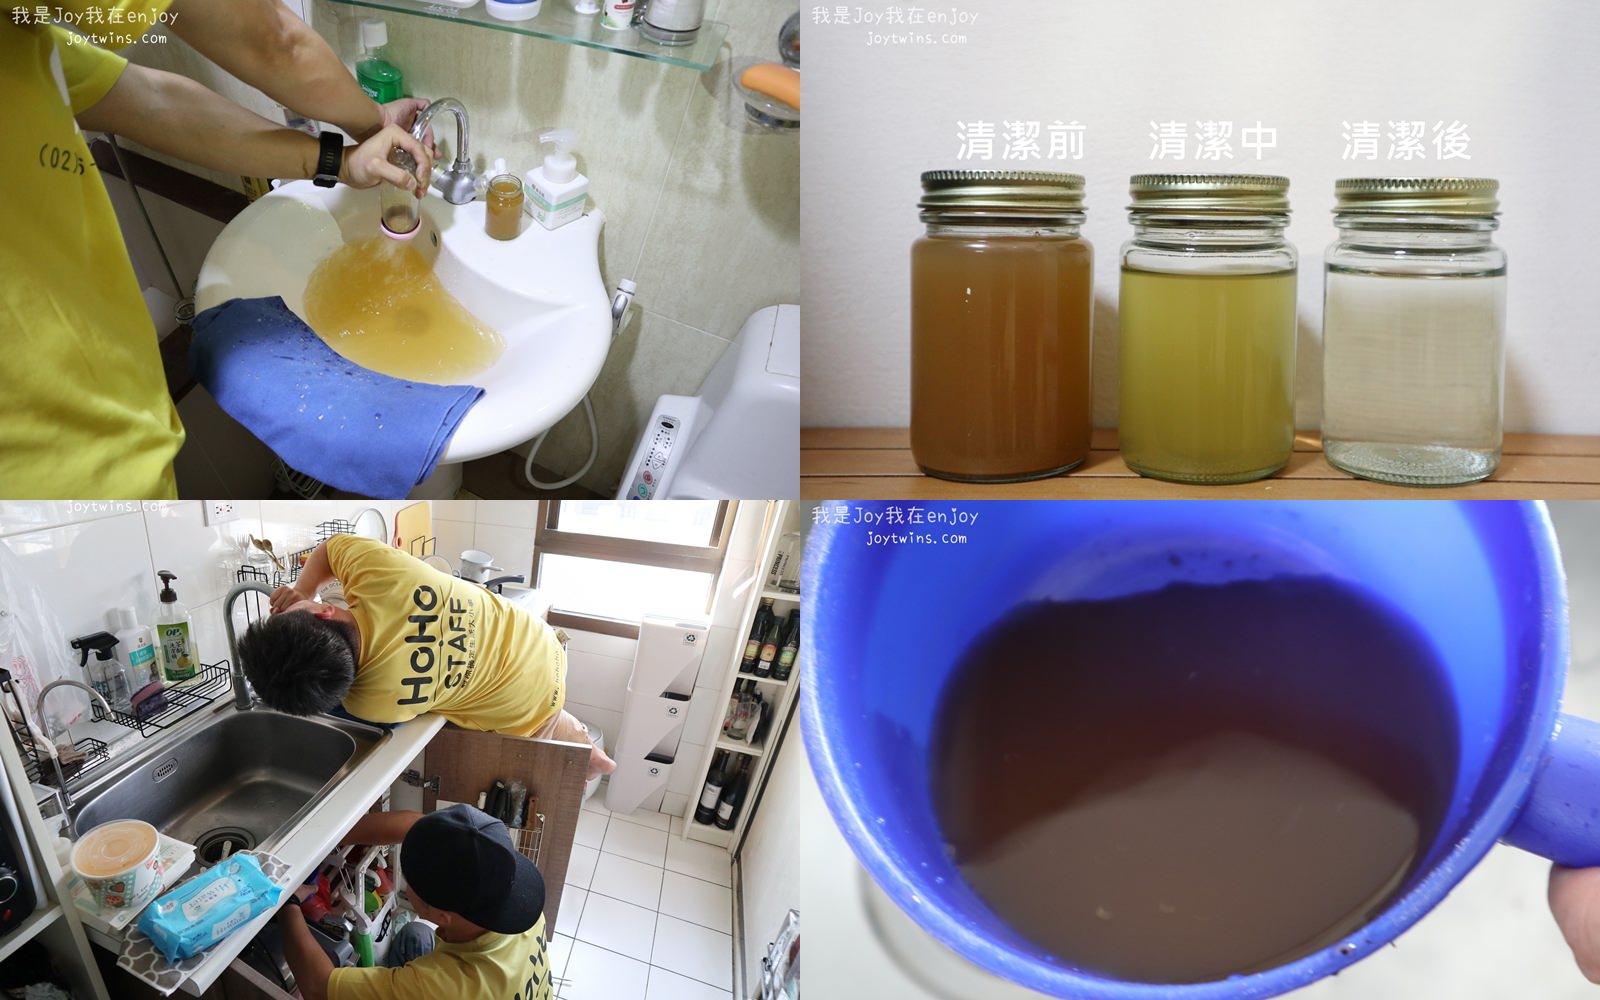 HoHo 好生活 – 居家水管清洗服務 只洗水塔不夠 清洗居家所有水管 告別陳年水管髒污